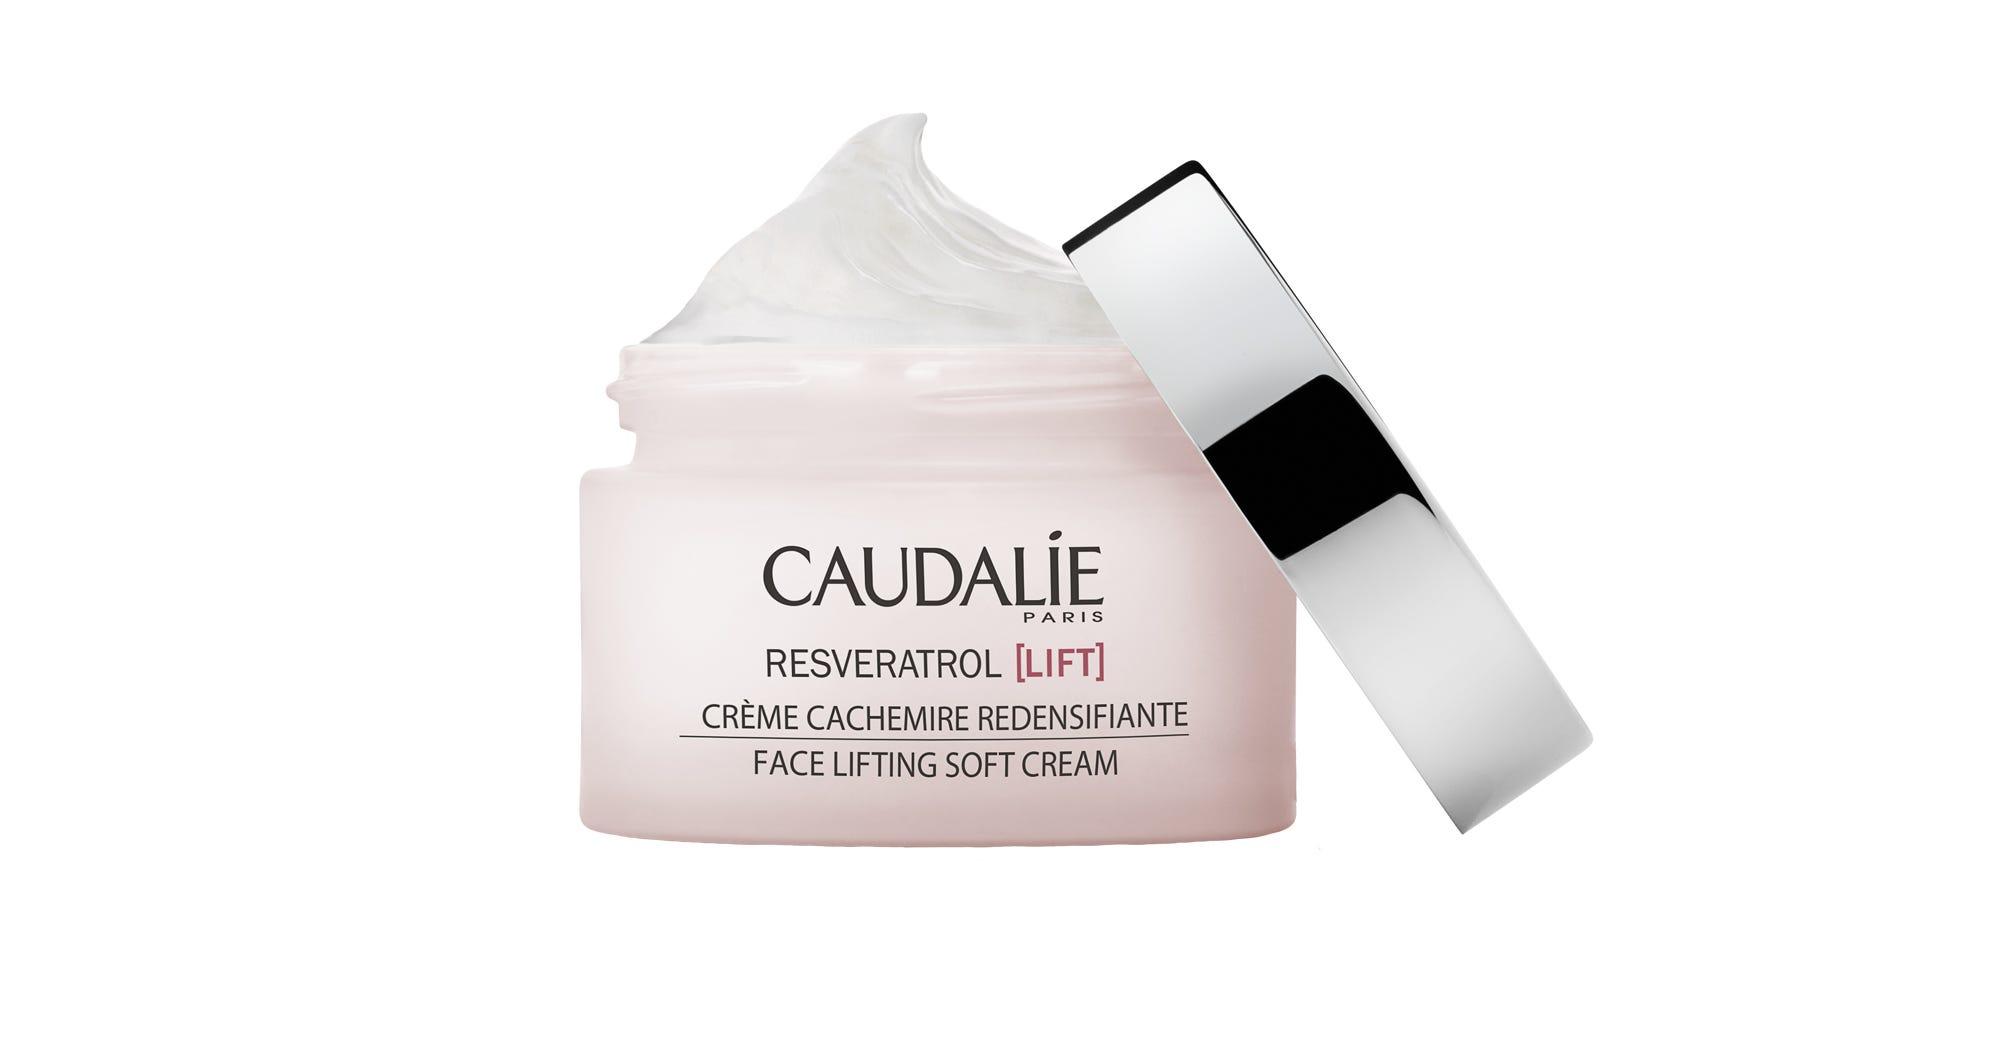 new caudalie resveratrol face lifting cream review. Black Bedroom Furniture Sets. Home Design Ideas